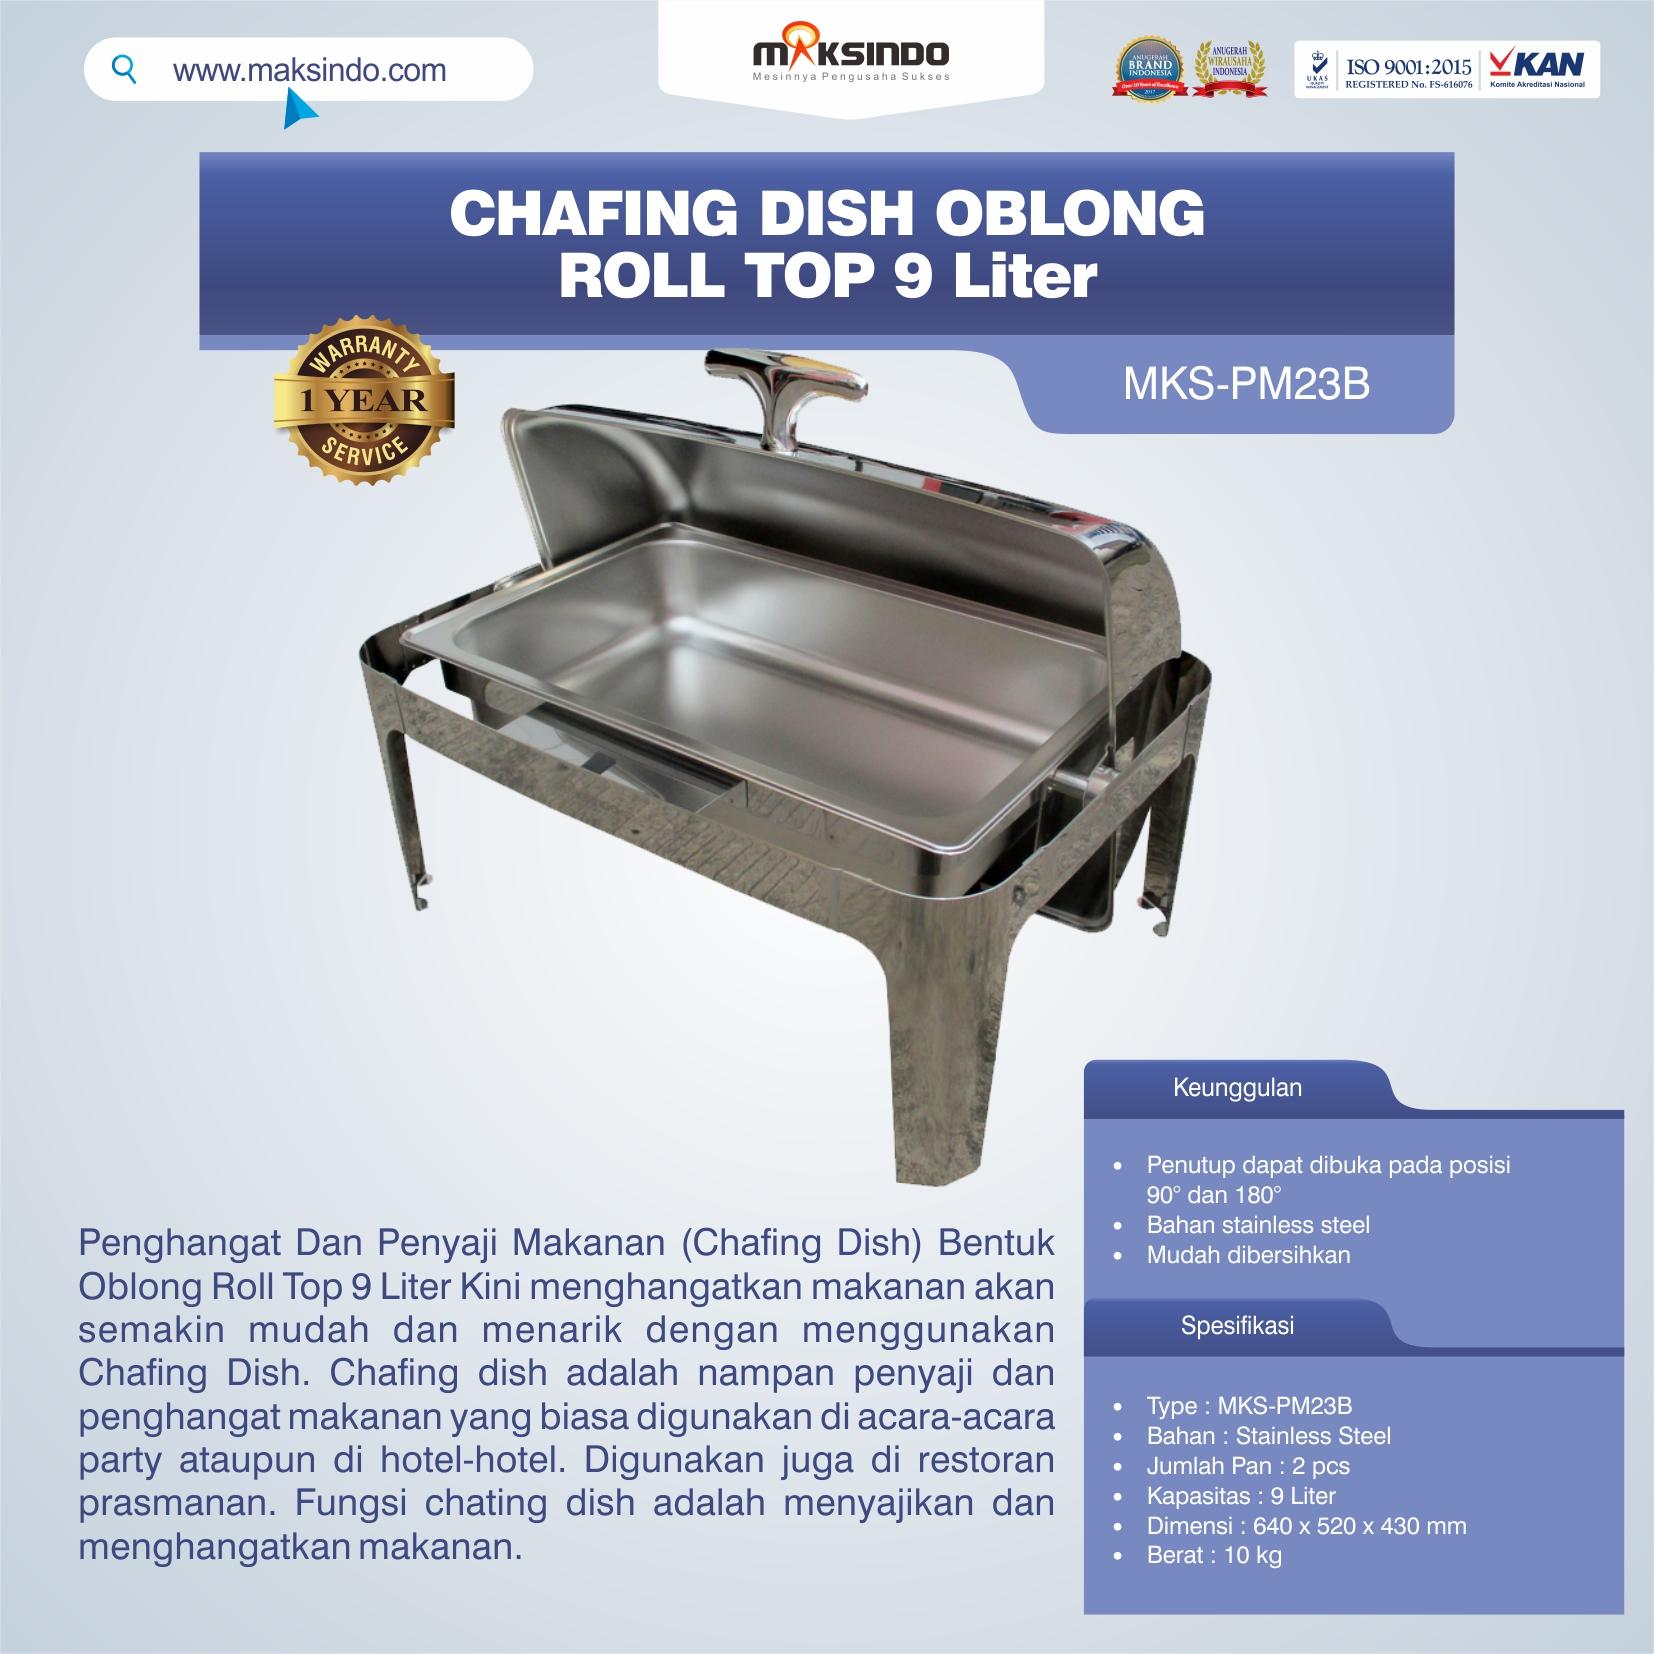 Jual Chafing Dish Oblong Roll Top – 9 Liter Di Bandung